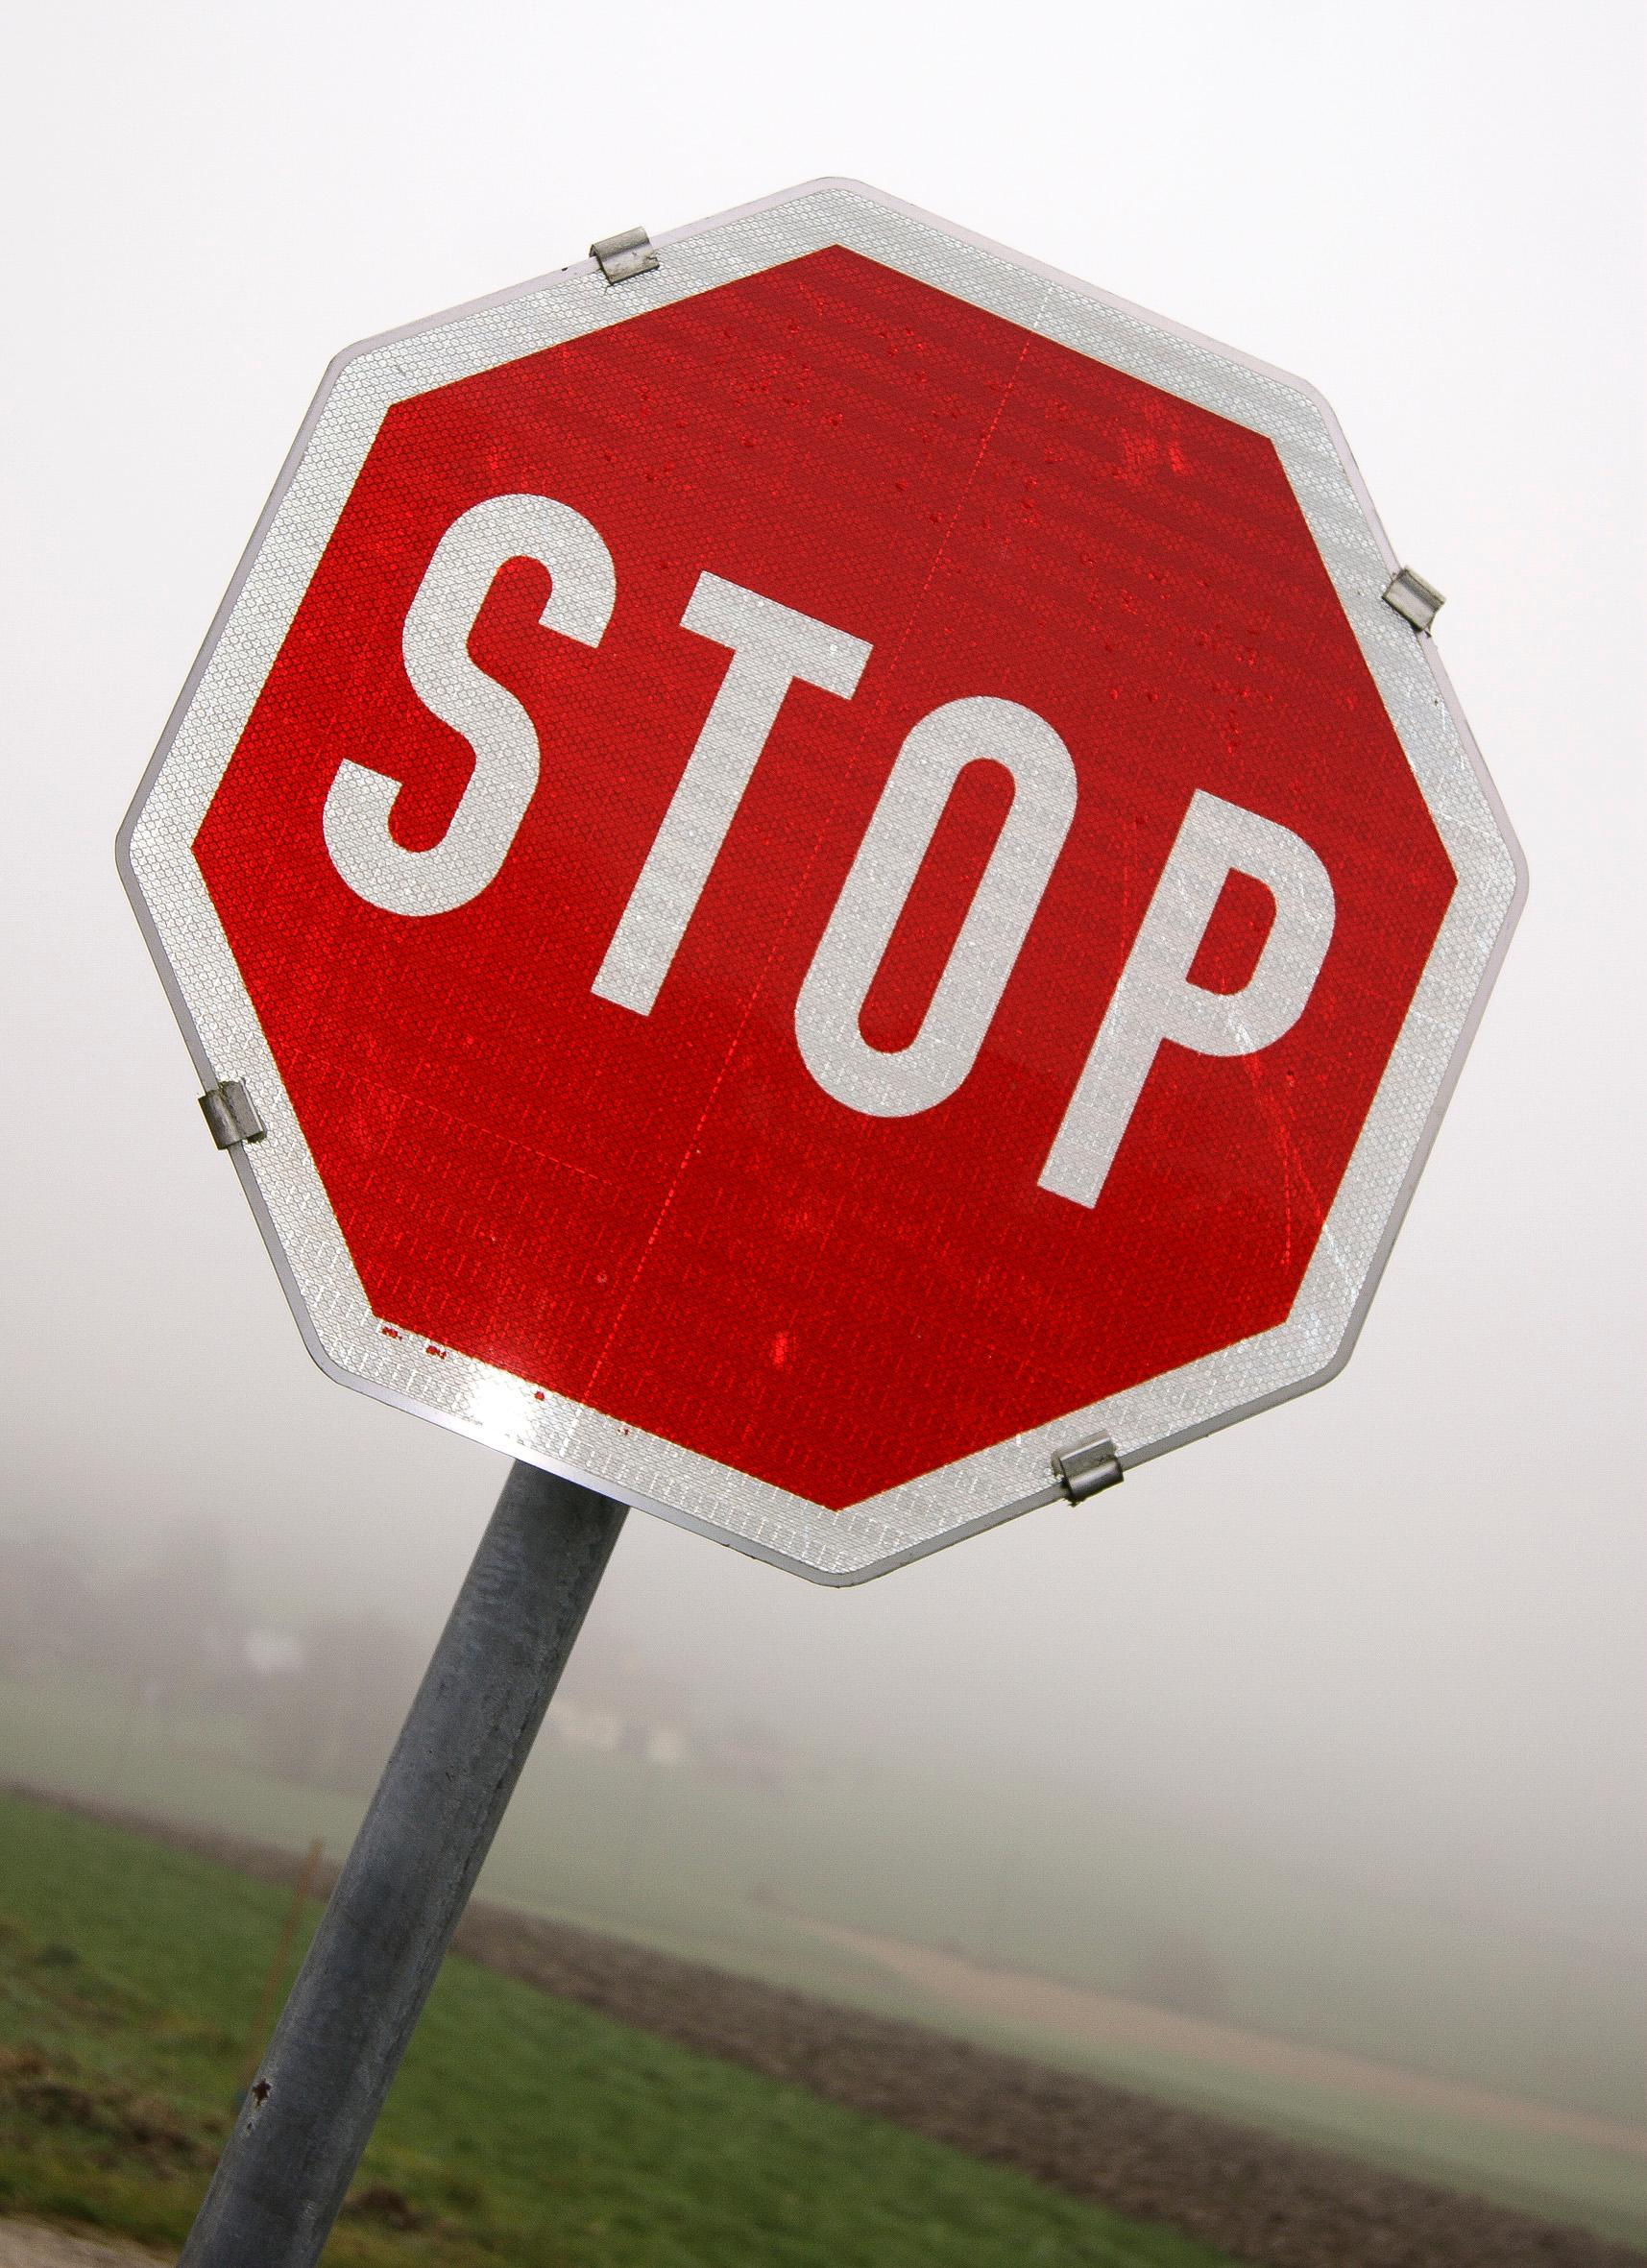 Stopp (c) www.pixabay.com